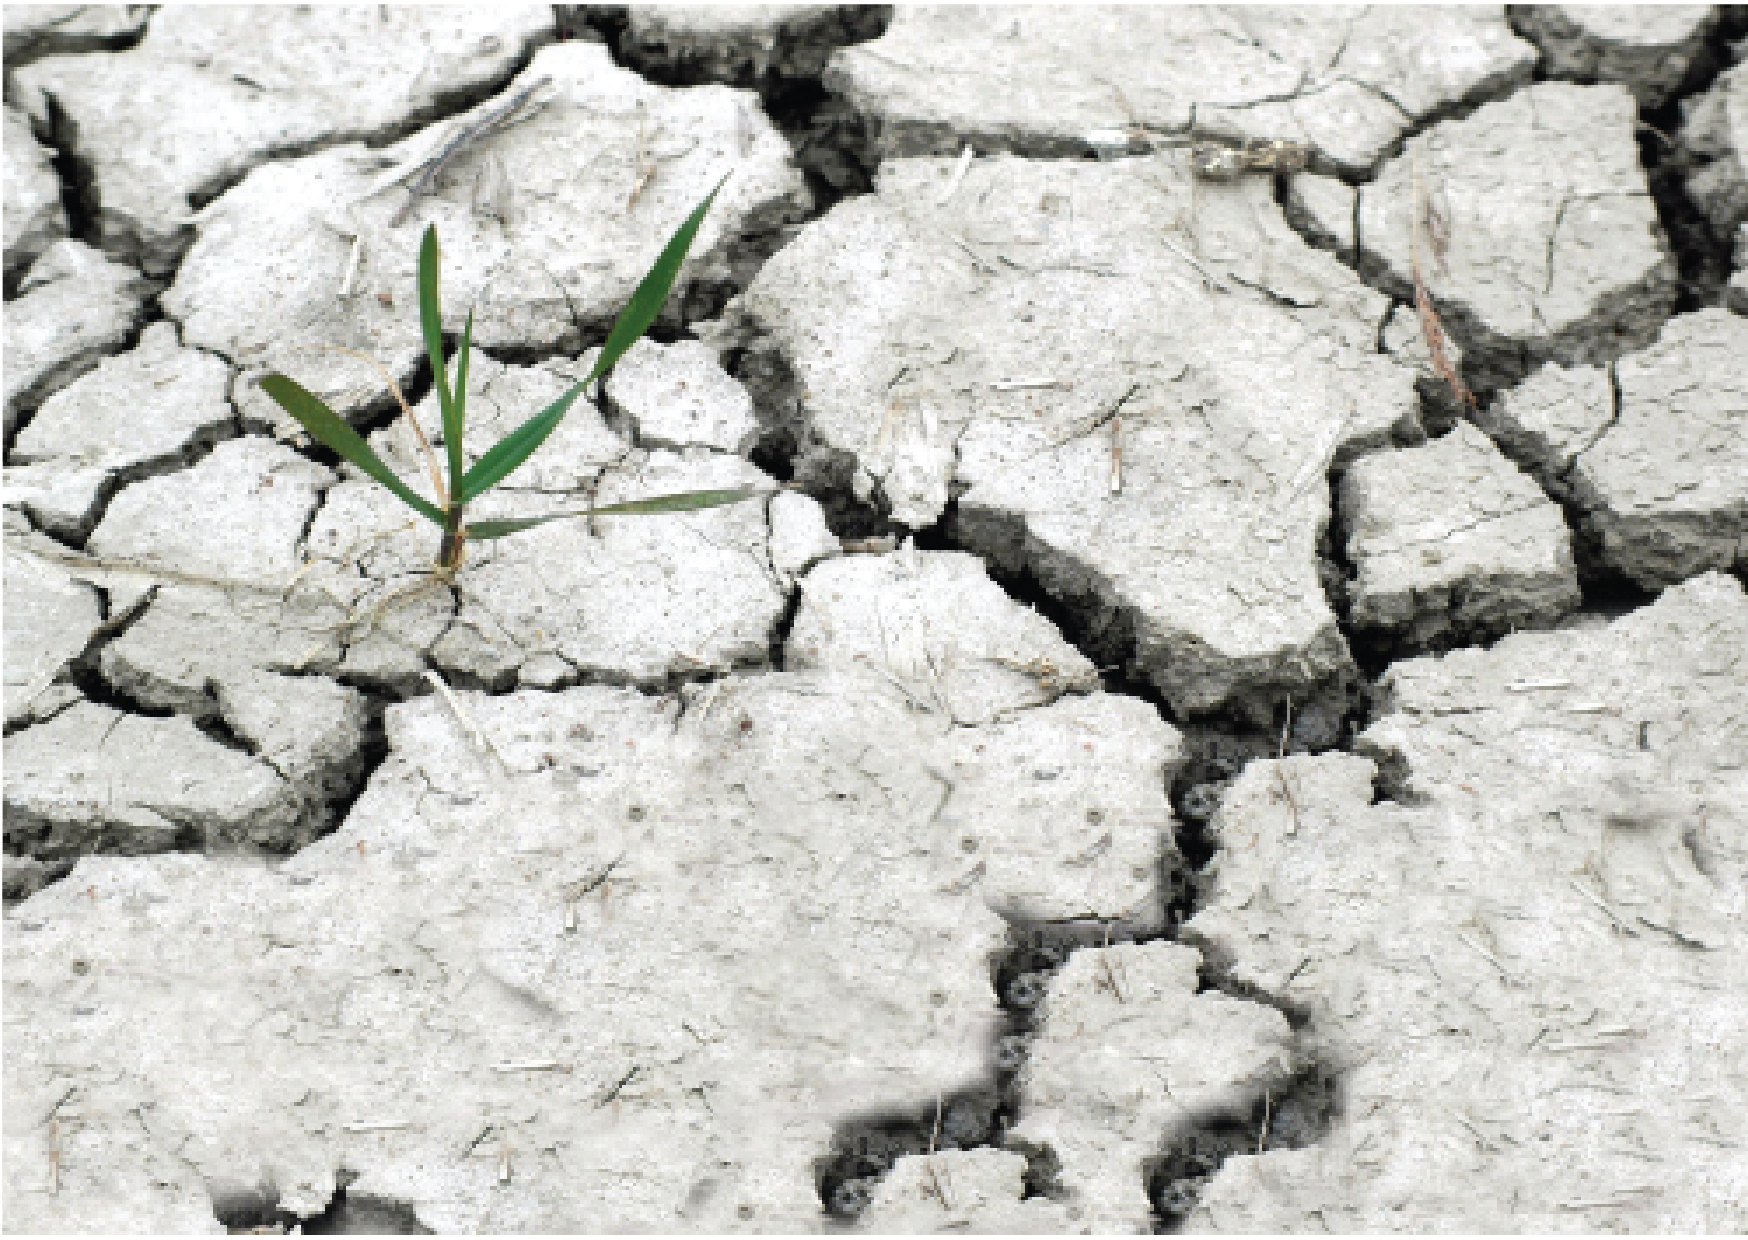 Environmental degredation